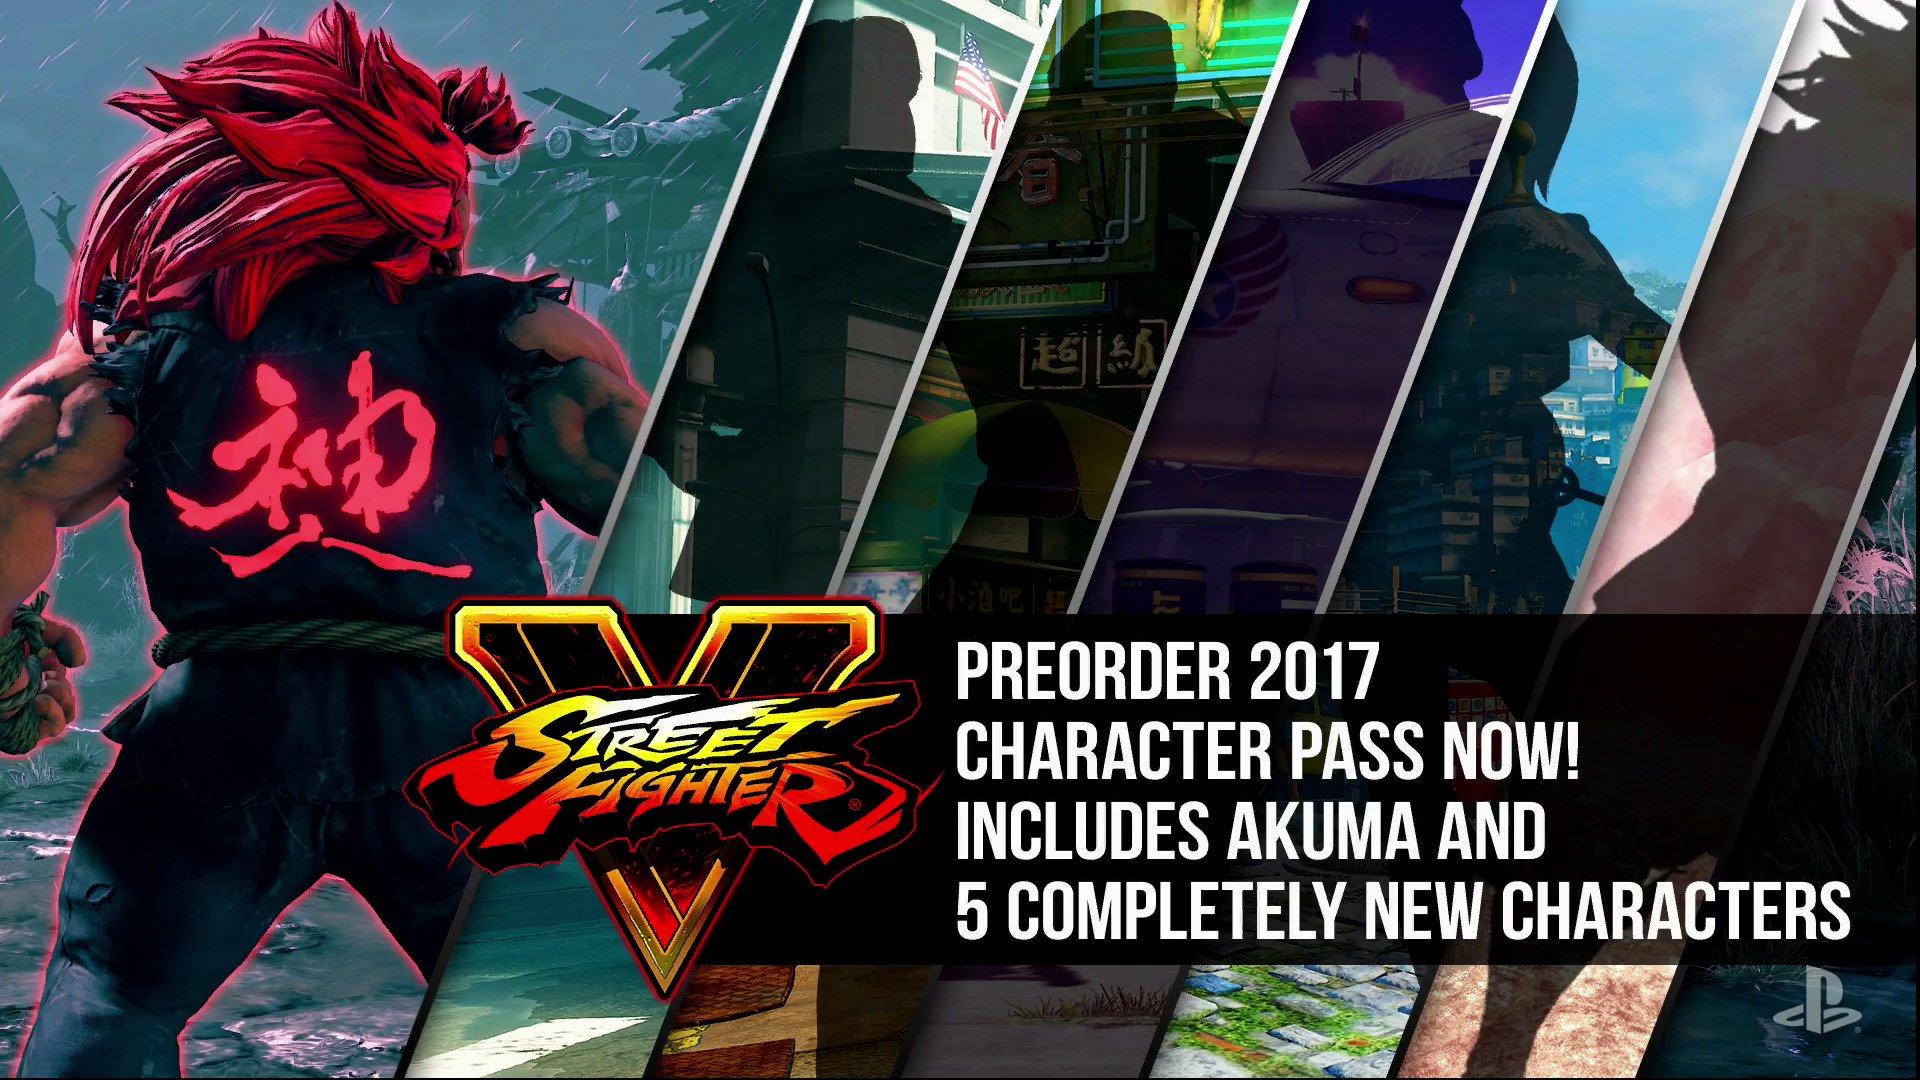 Street Fighter V Playstation Store Image Provides More Season 2